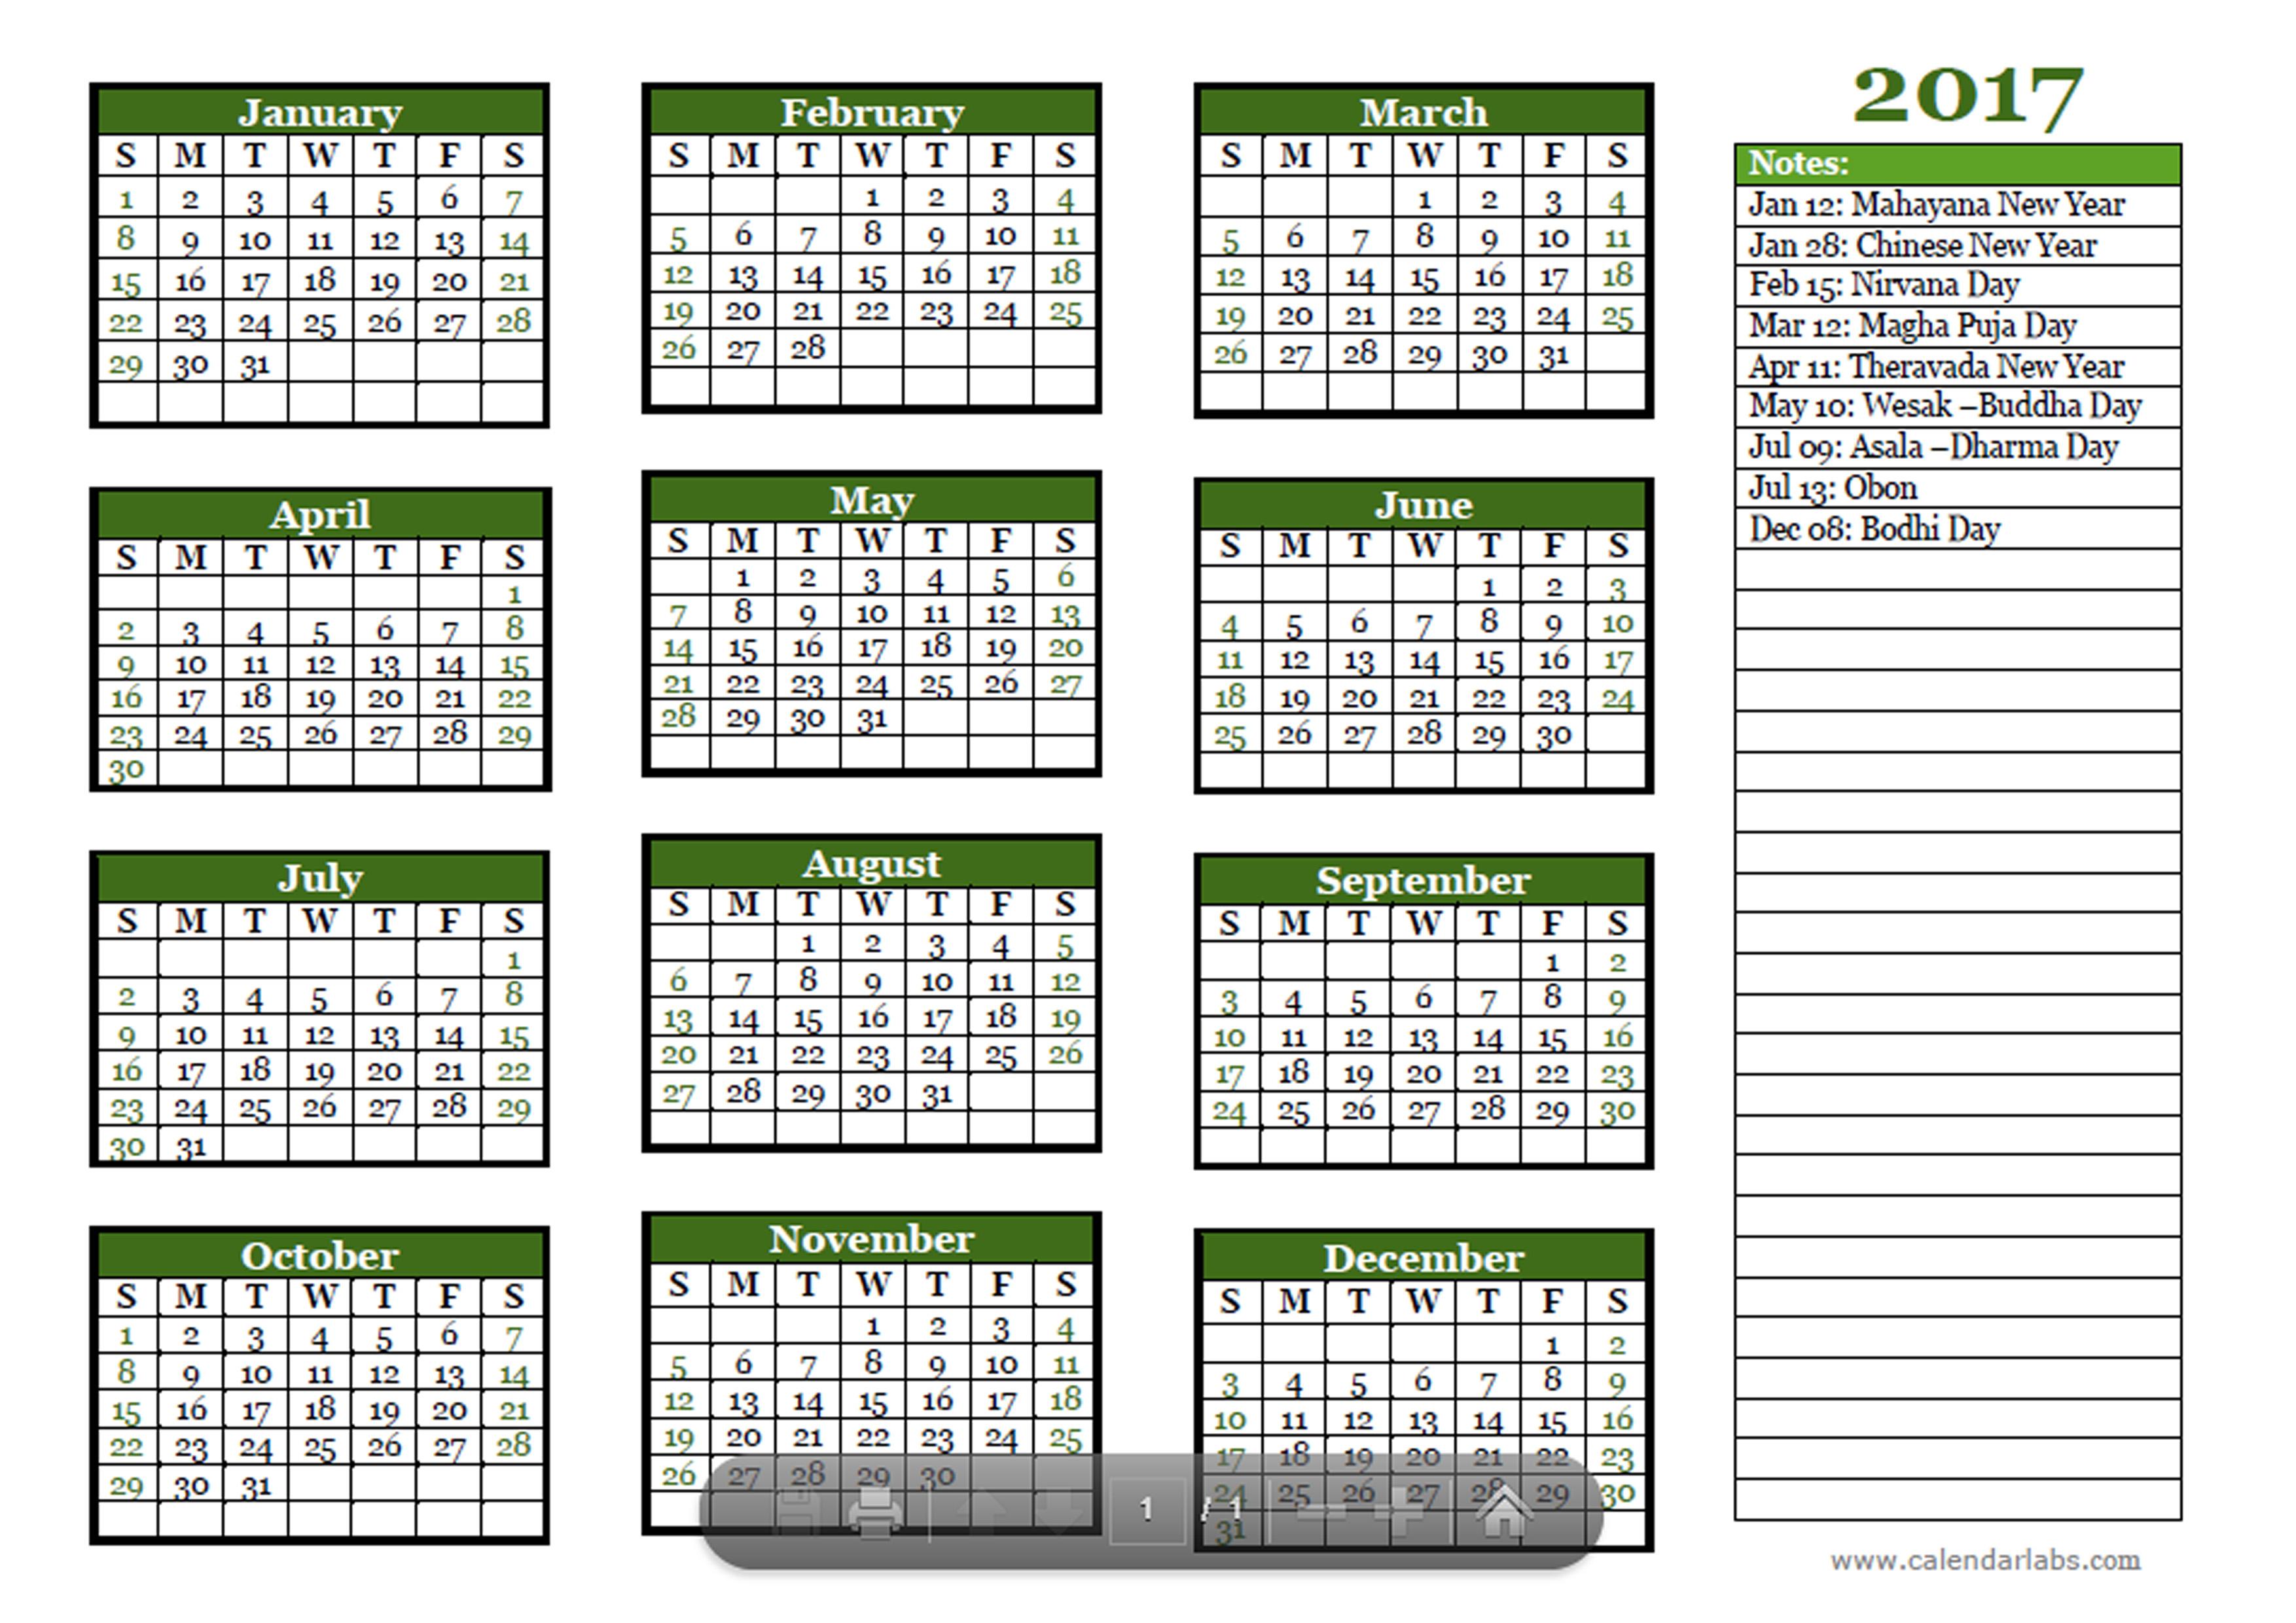 2017 Buddhist Festivals Calendar Template - Free Printable ...